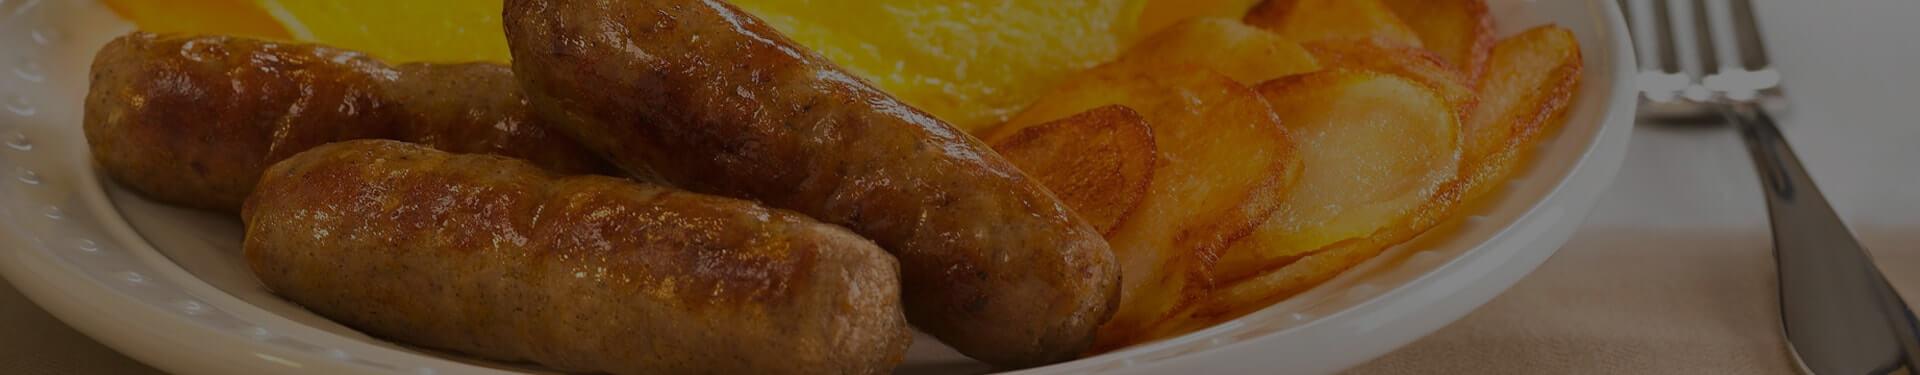 Plated Jones Breakfast Sausage Links